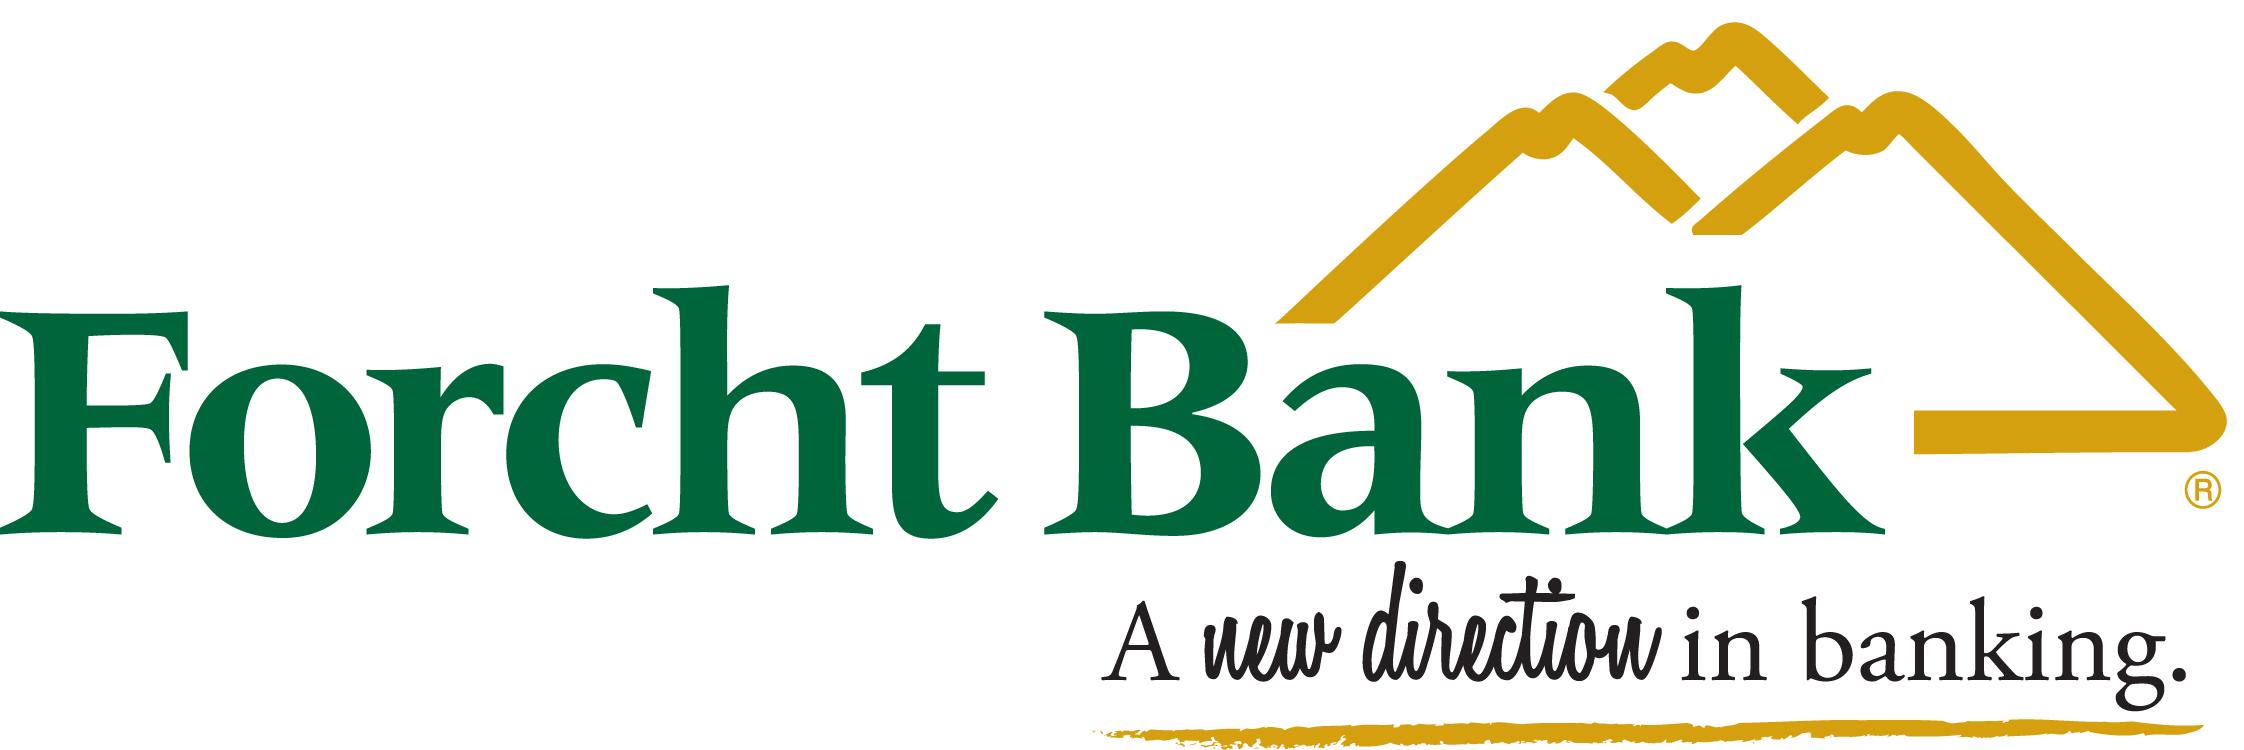 forchtbank_logo_horz.jpg